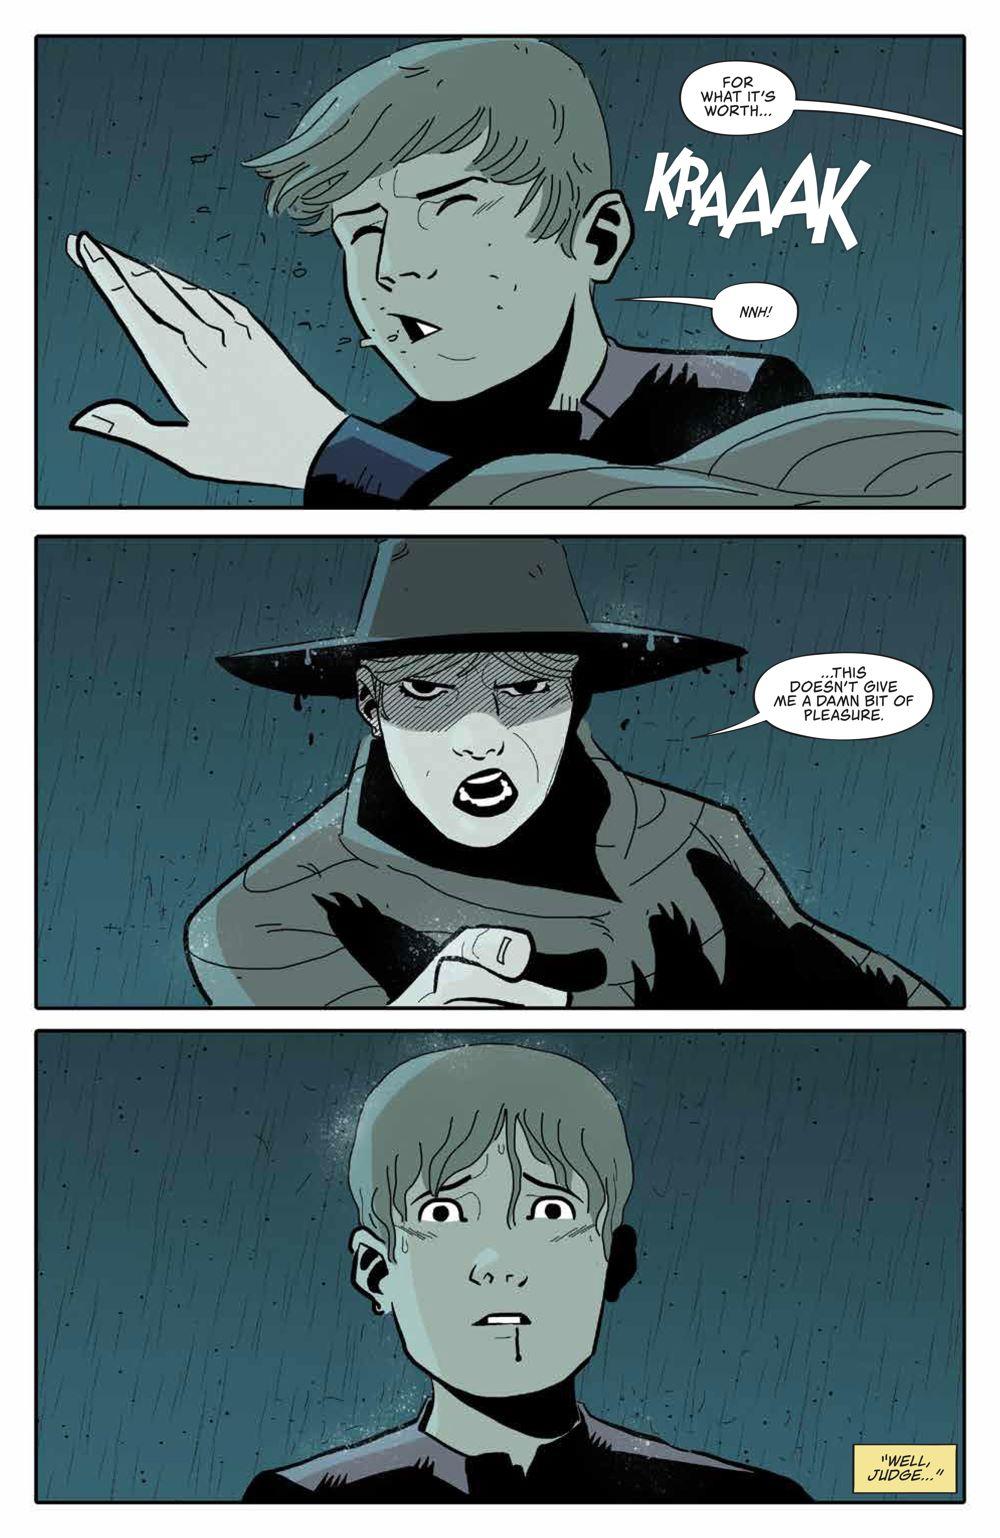 Firefly_NewSheriffVerse_v1_HC_PRESS_14 ComicList Previews: FIREFLY NEW SHERIFF IN THE 'VERSE VOLUME 1 HC